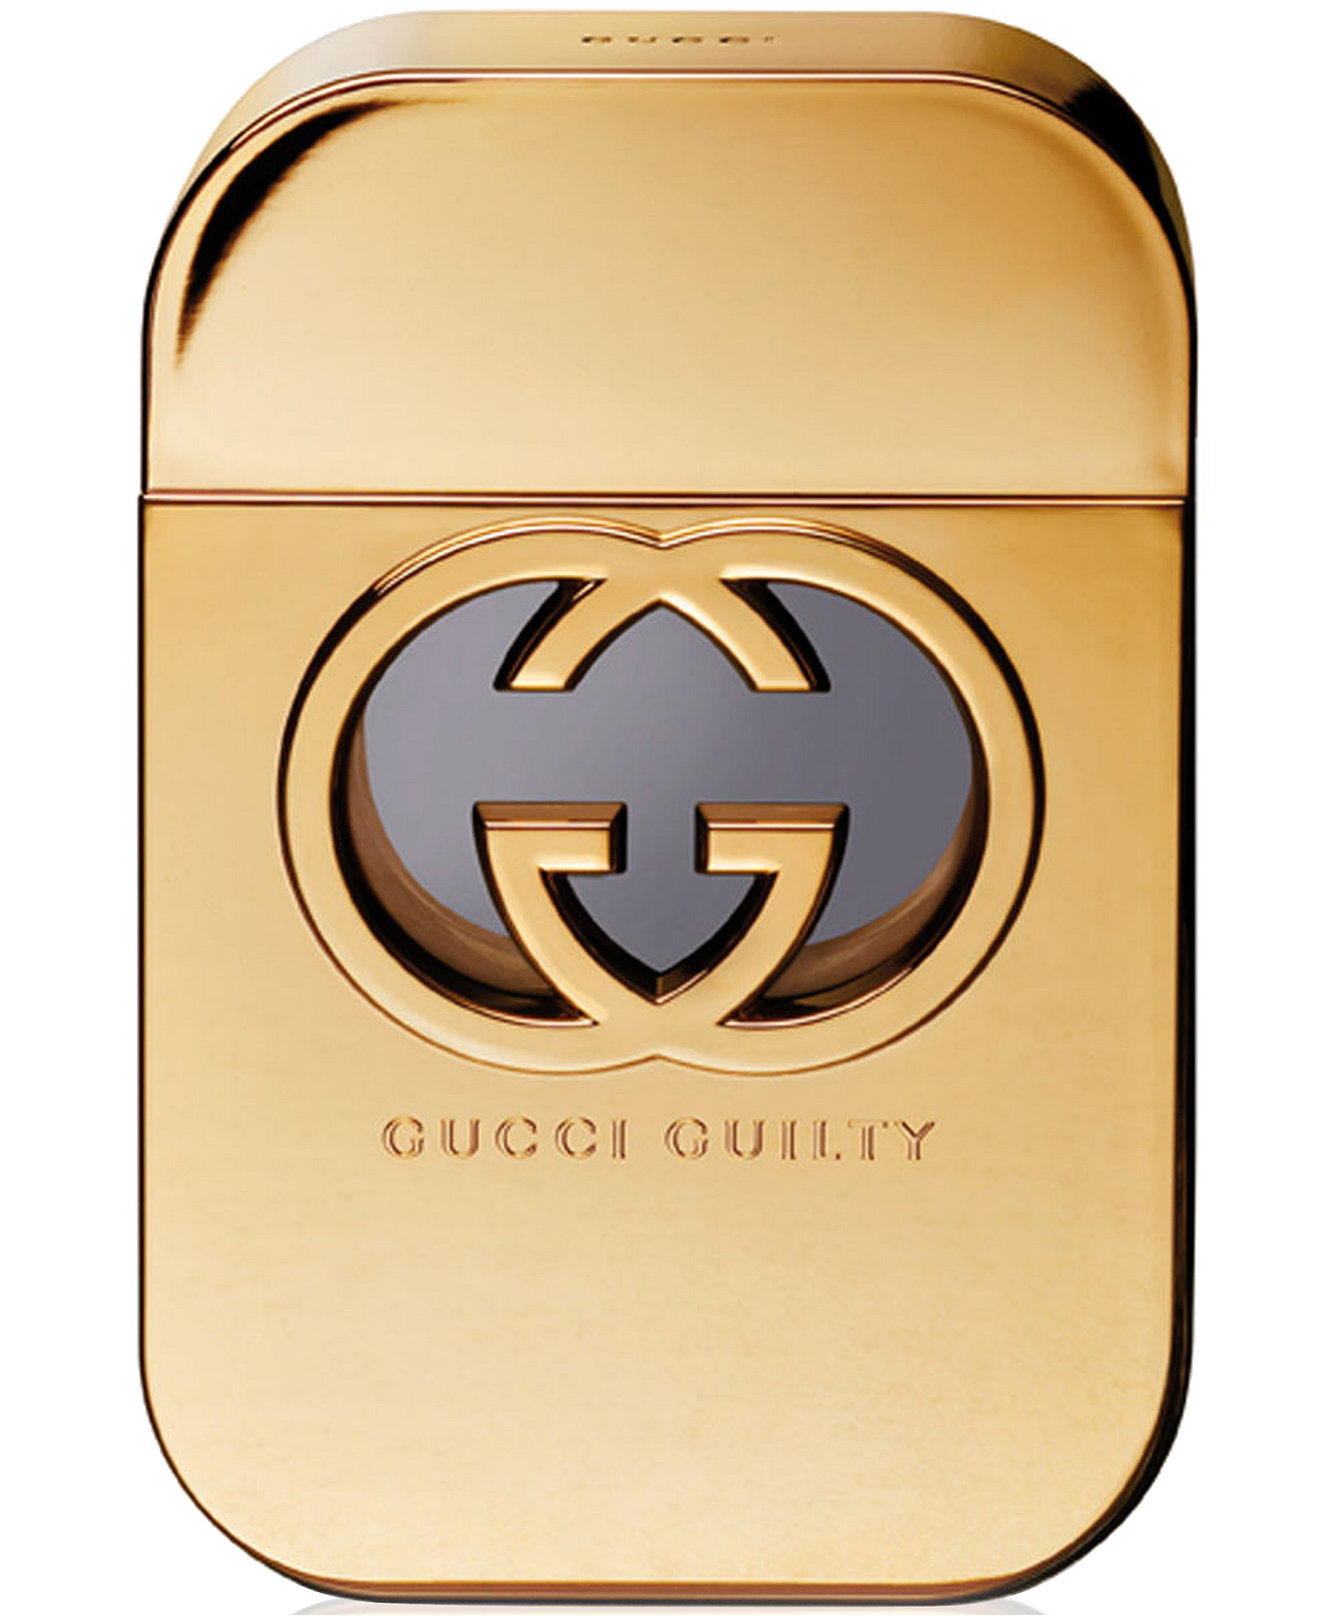 gucci bathroom set. Gucci Bathroom Set Design   kristybaby com